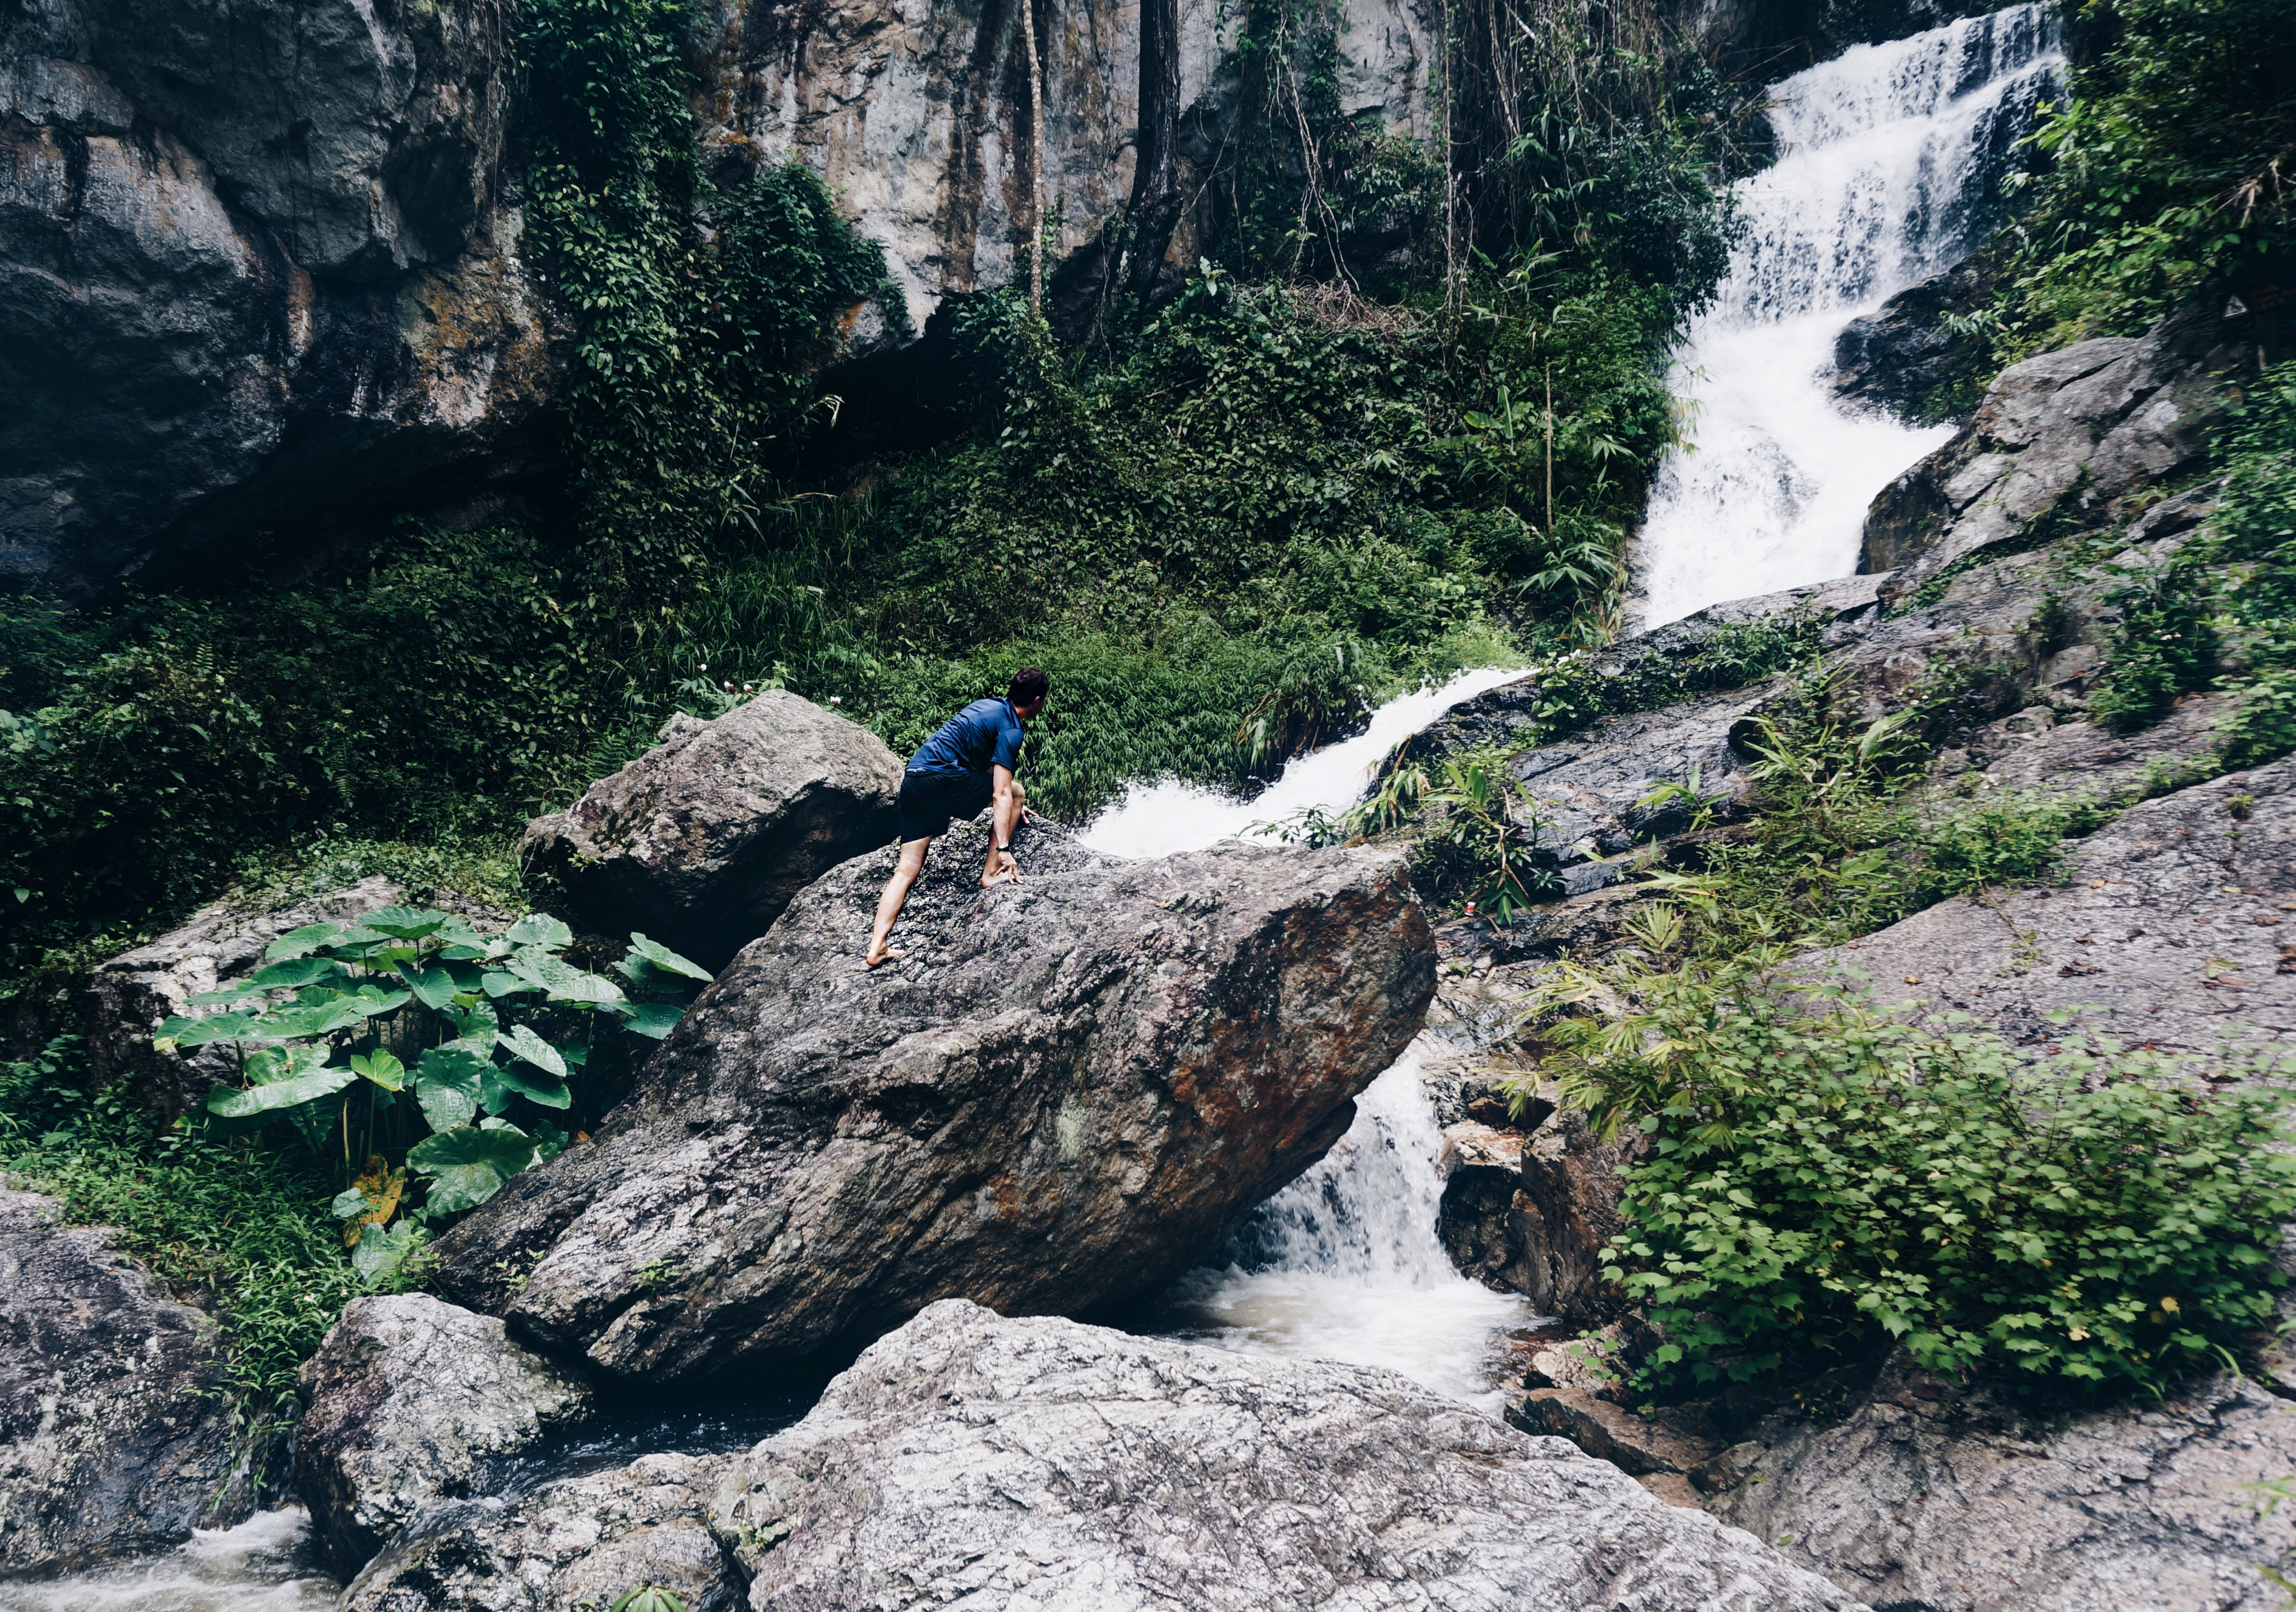 Wasserfall in Thailand, Klettern am Wasserfall Chiang Mai